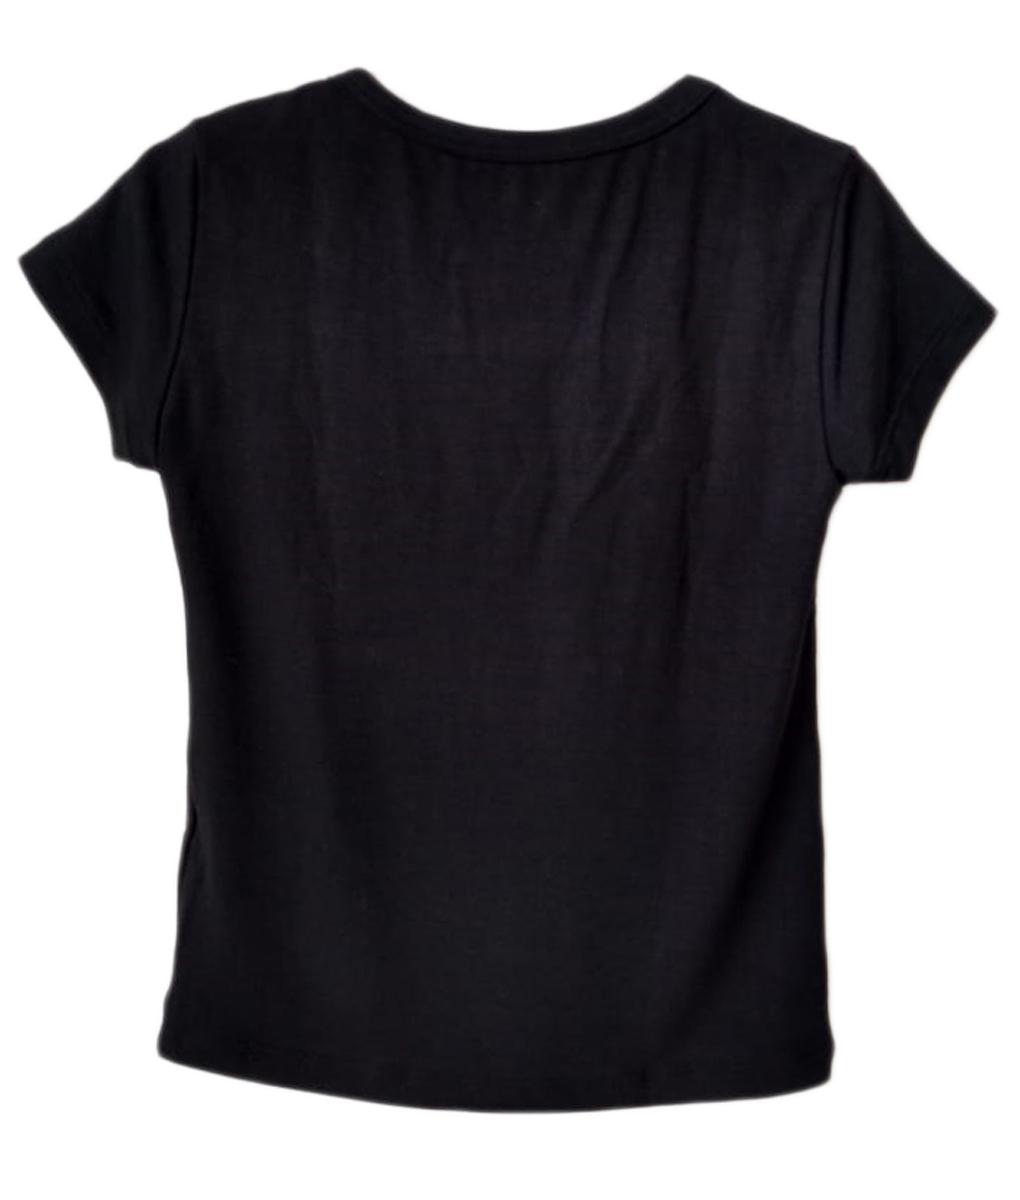 Tshirt Infantil Feminina Porquinha